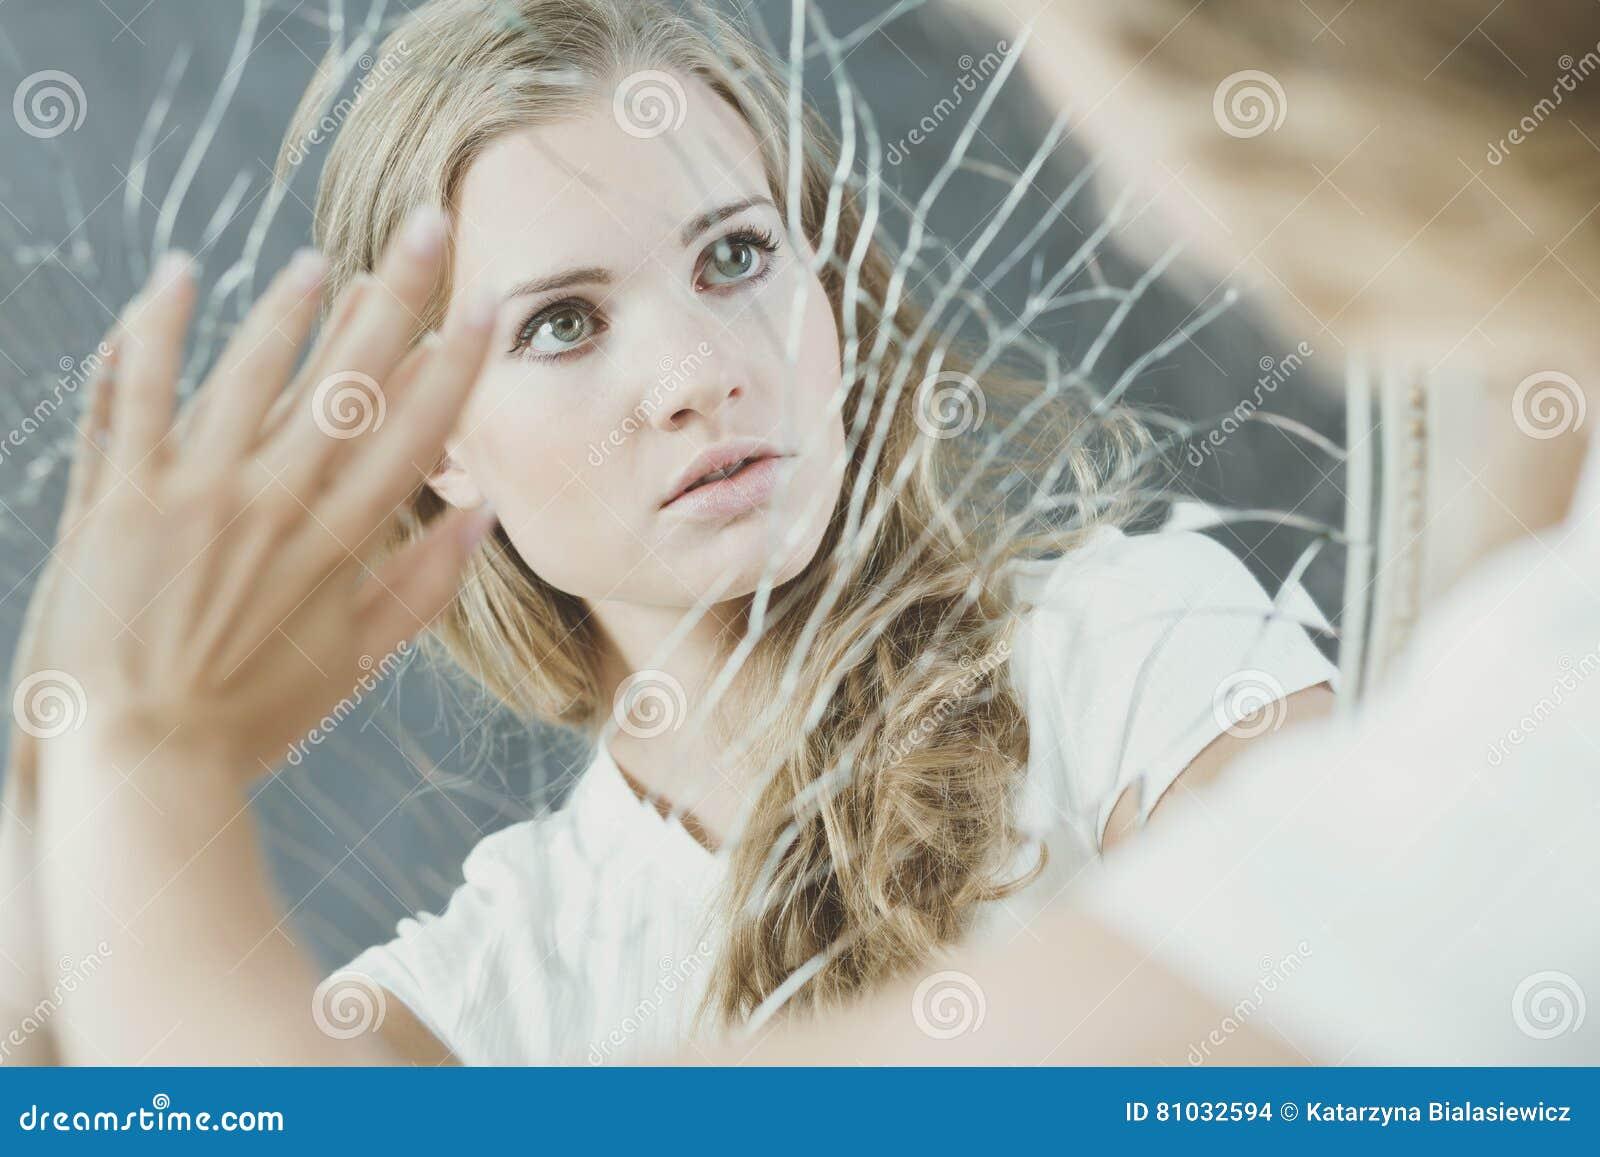 Espejo roto conmovedor del adolescente